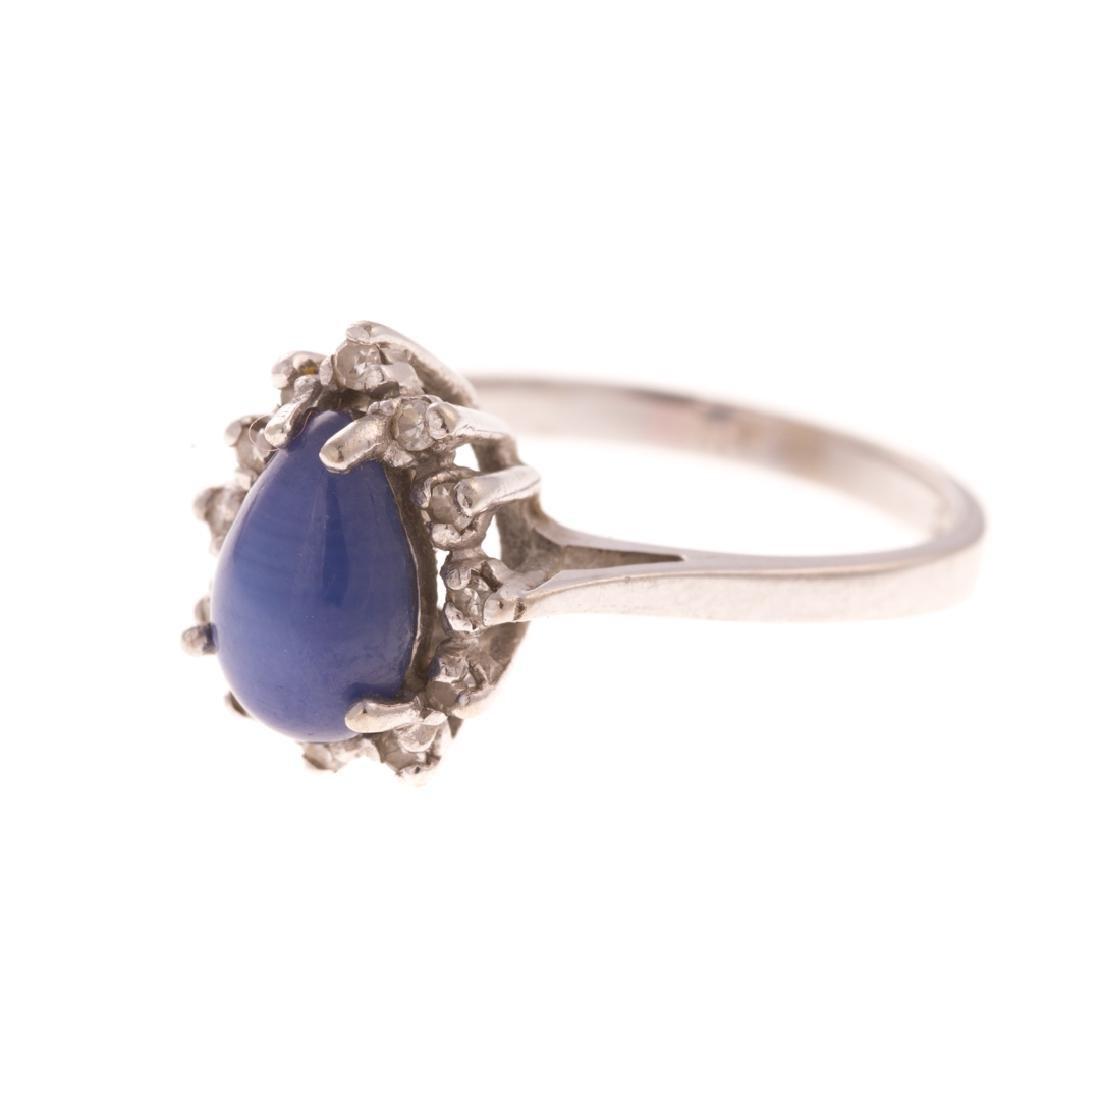 A Lady's White Gold Diamond Bracelet & Ring - 6